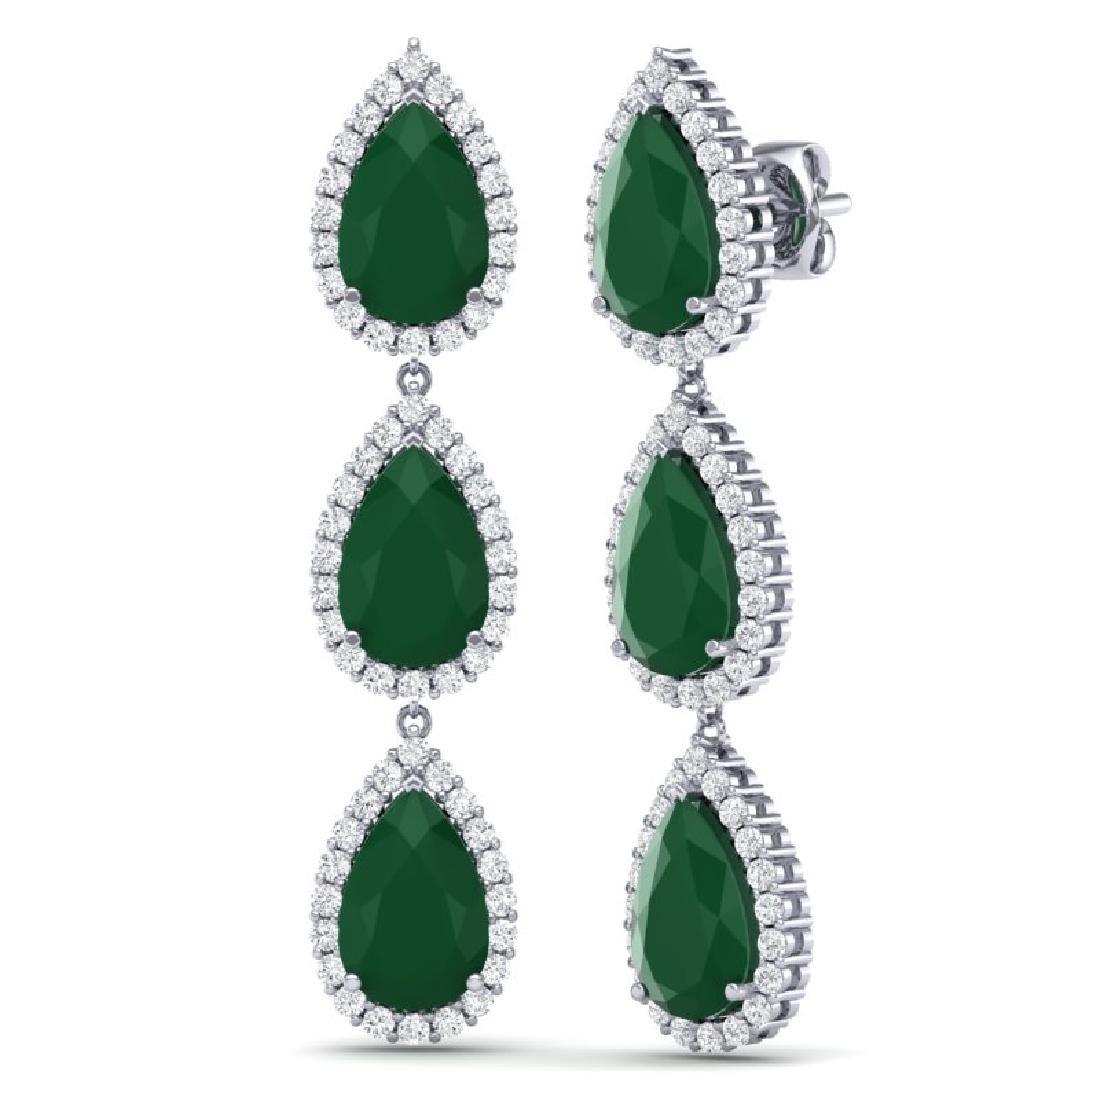 27.06 CTW Royalty Emerald & VS Diamond Earrings 18K - 3